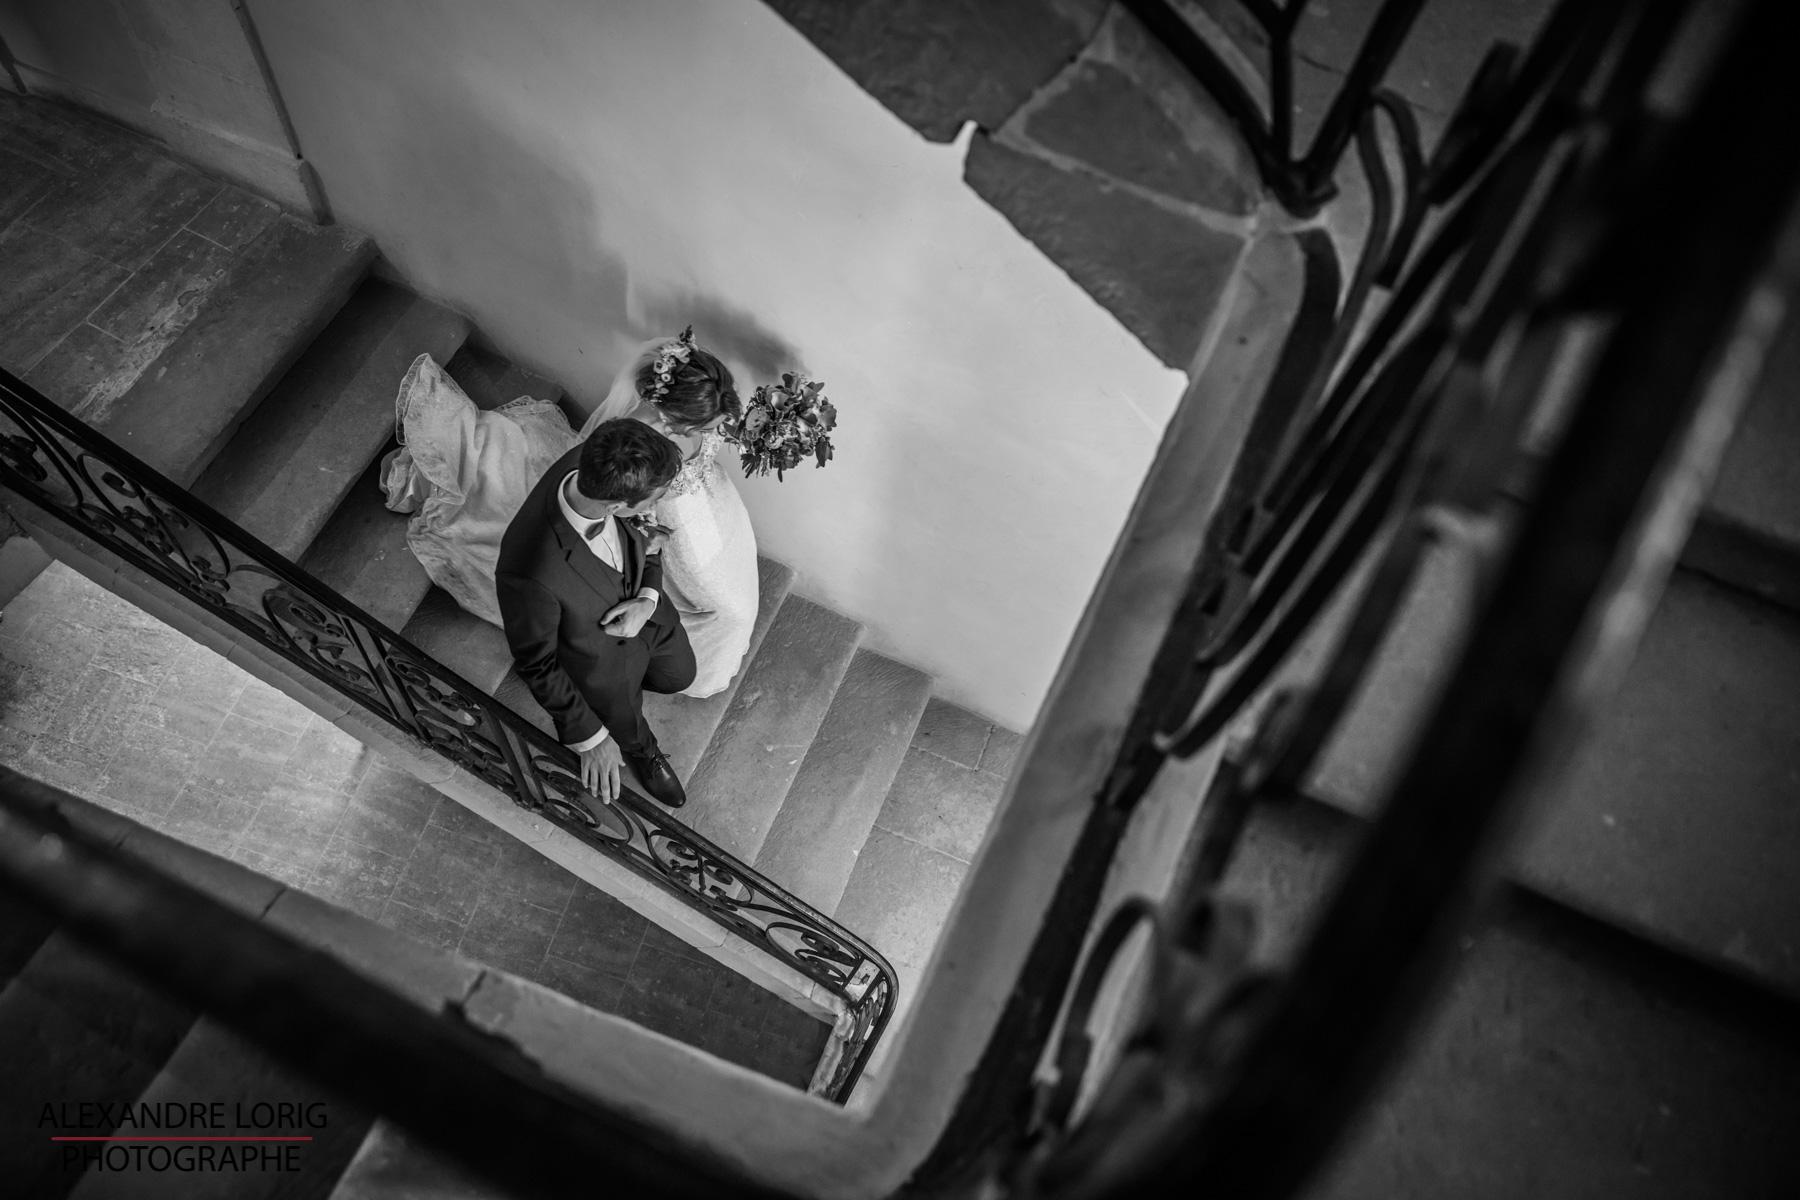 le coeur dans les etoiles - wedding planner provence - luberon - mariage provence - Alexandre Lorig - maries mairie